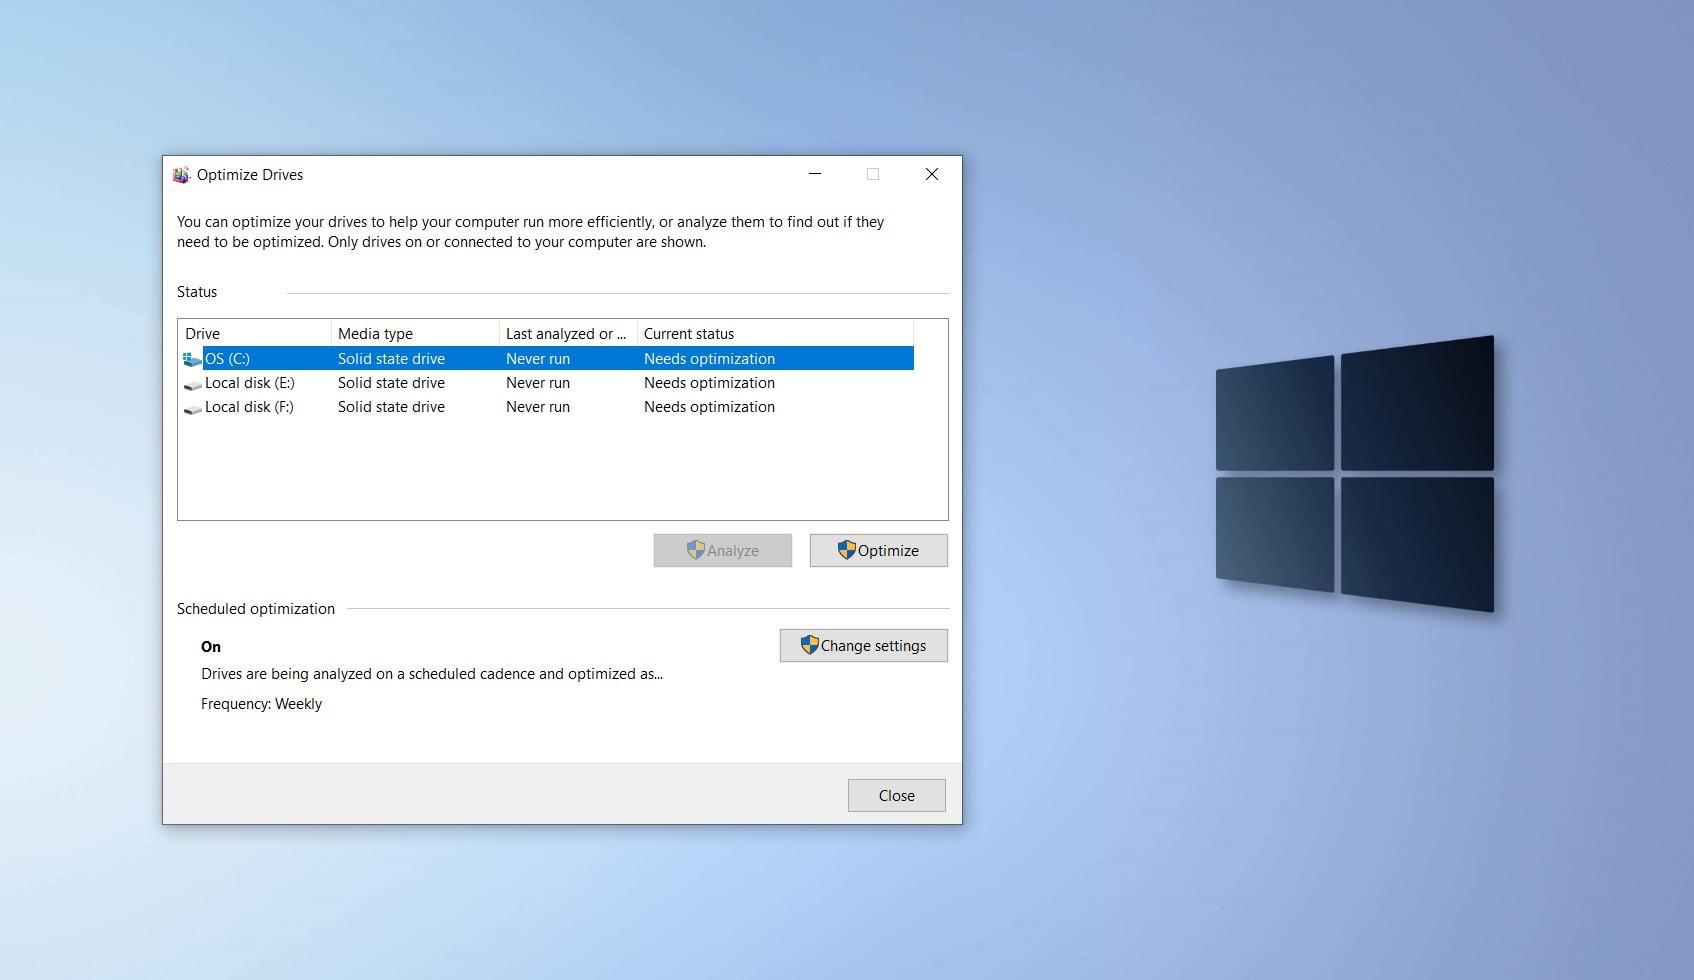 Windows 10 drive optimization tool